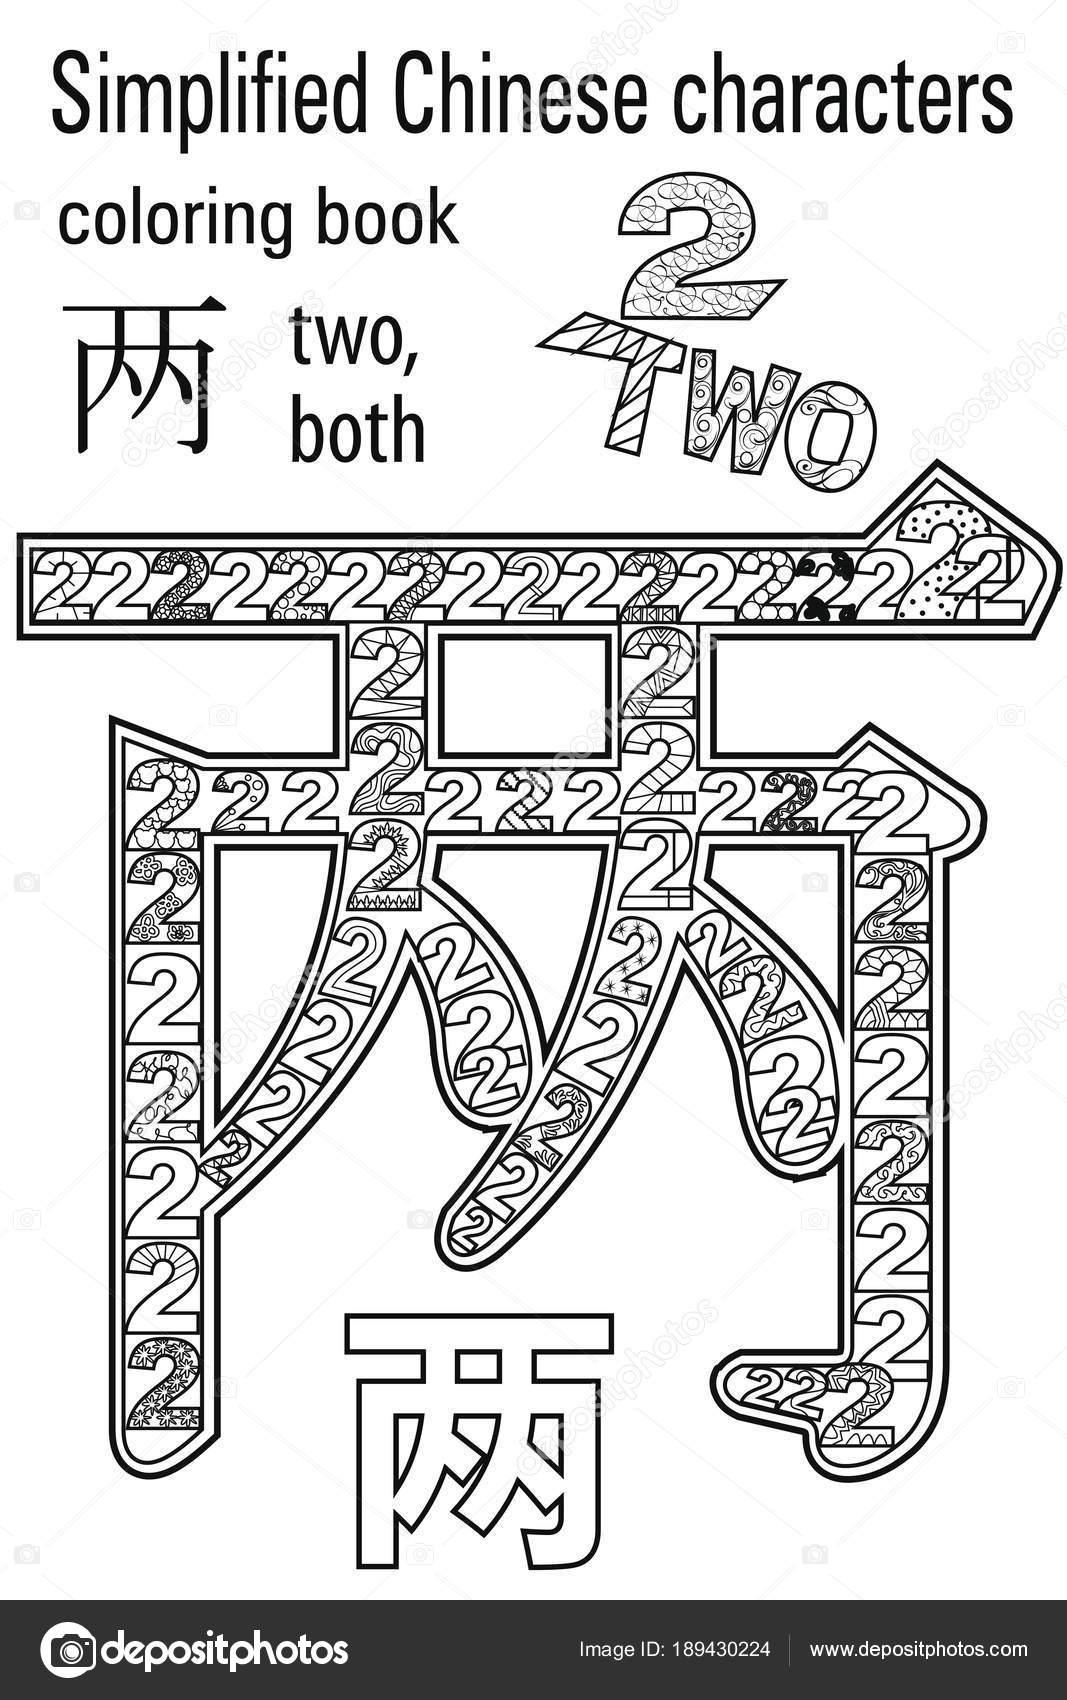 Letras chinas para colorear | Libro para colorear para adultos